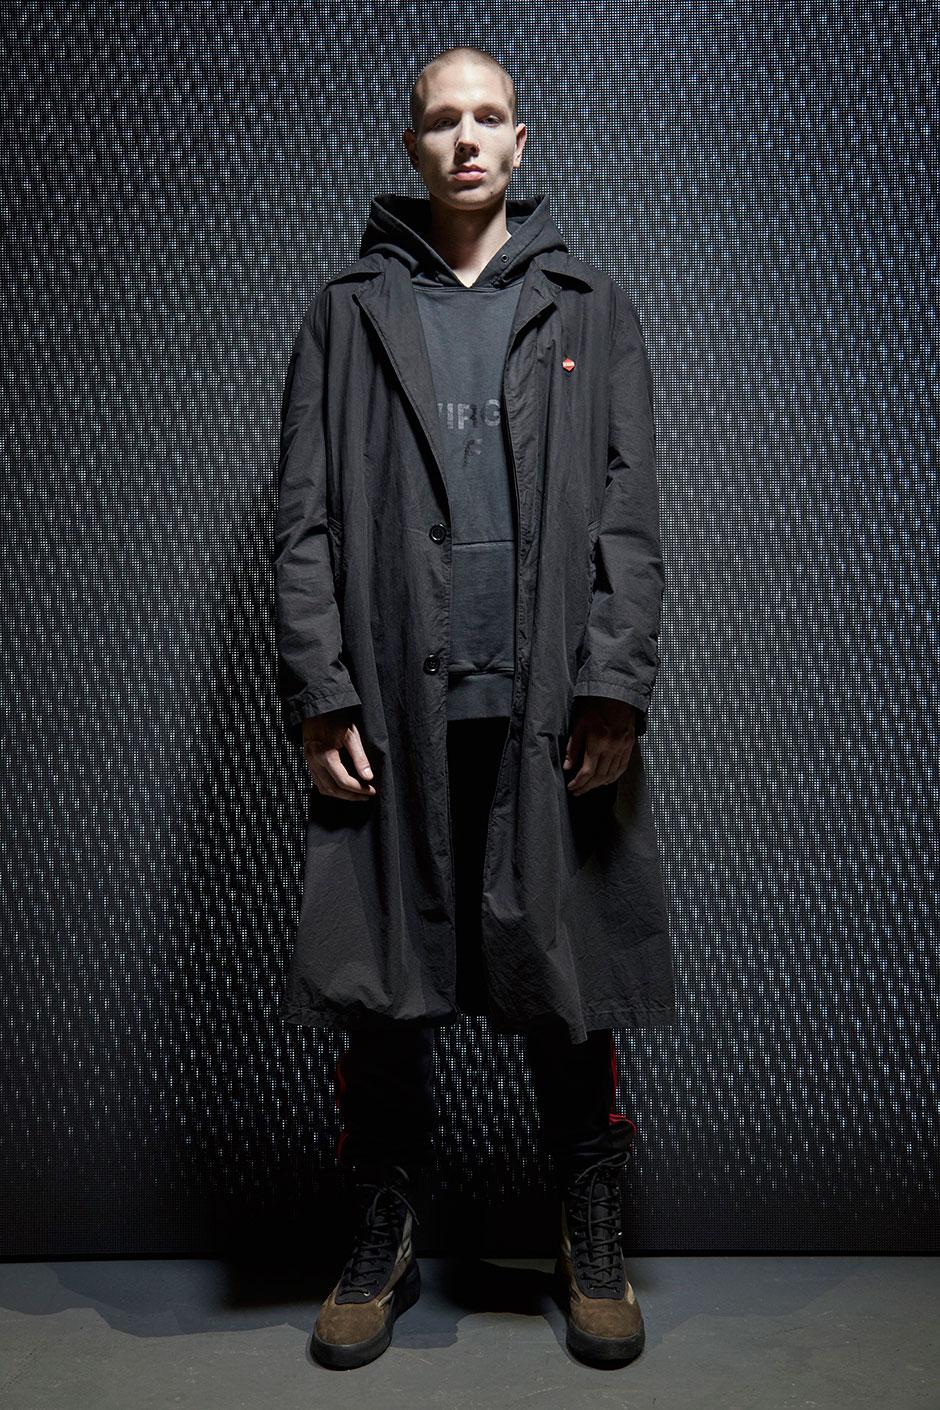 5d6b6f72cc08a Complete Yeezy Season 5 Clothing Footwear Recap